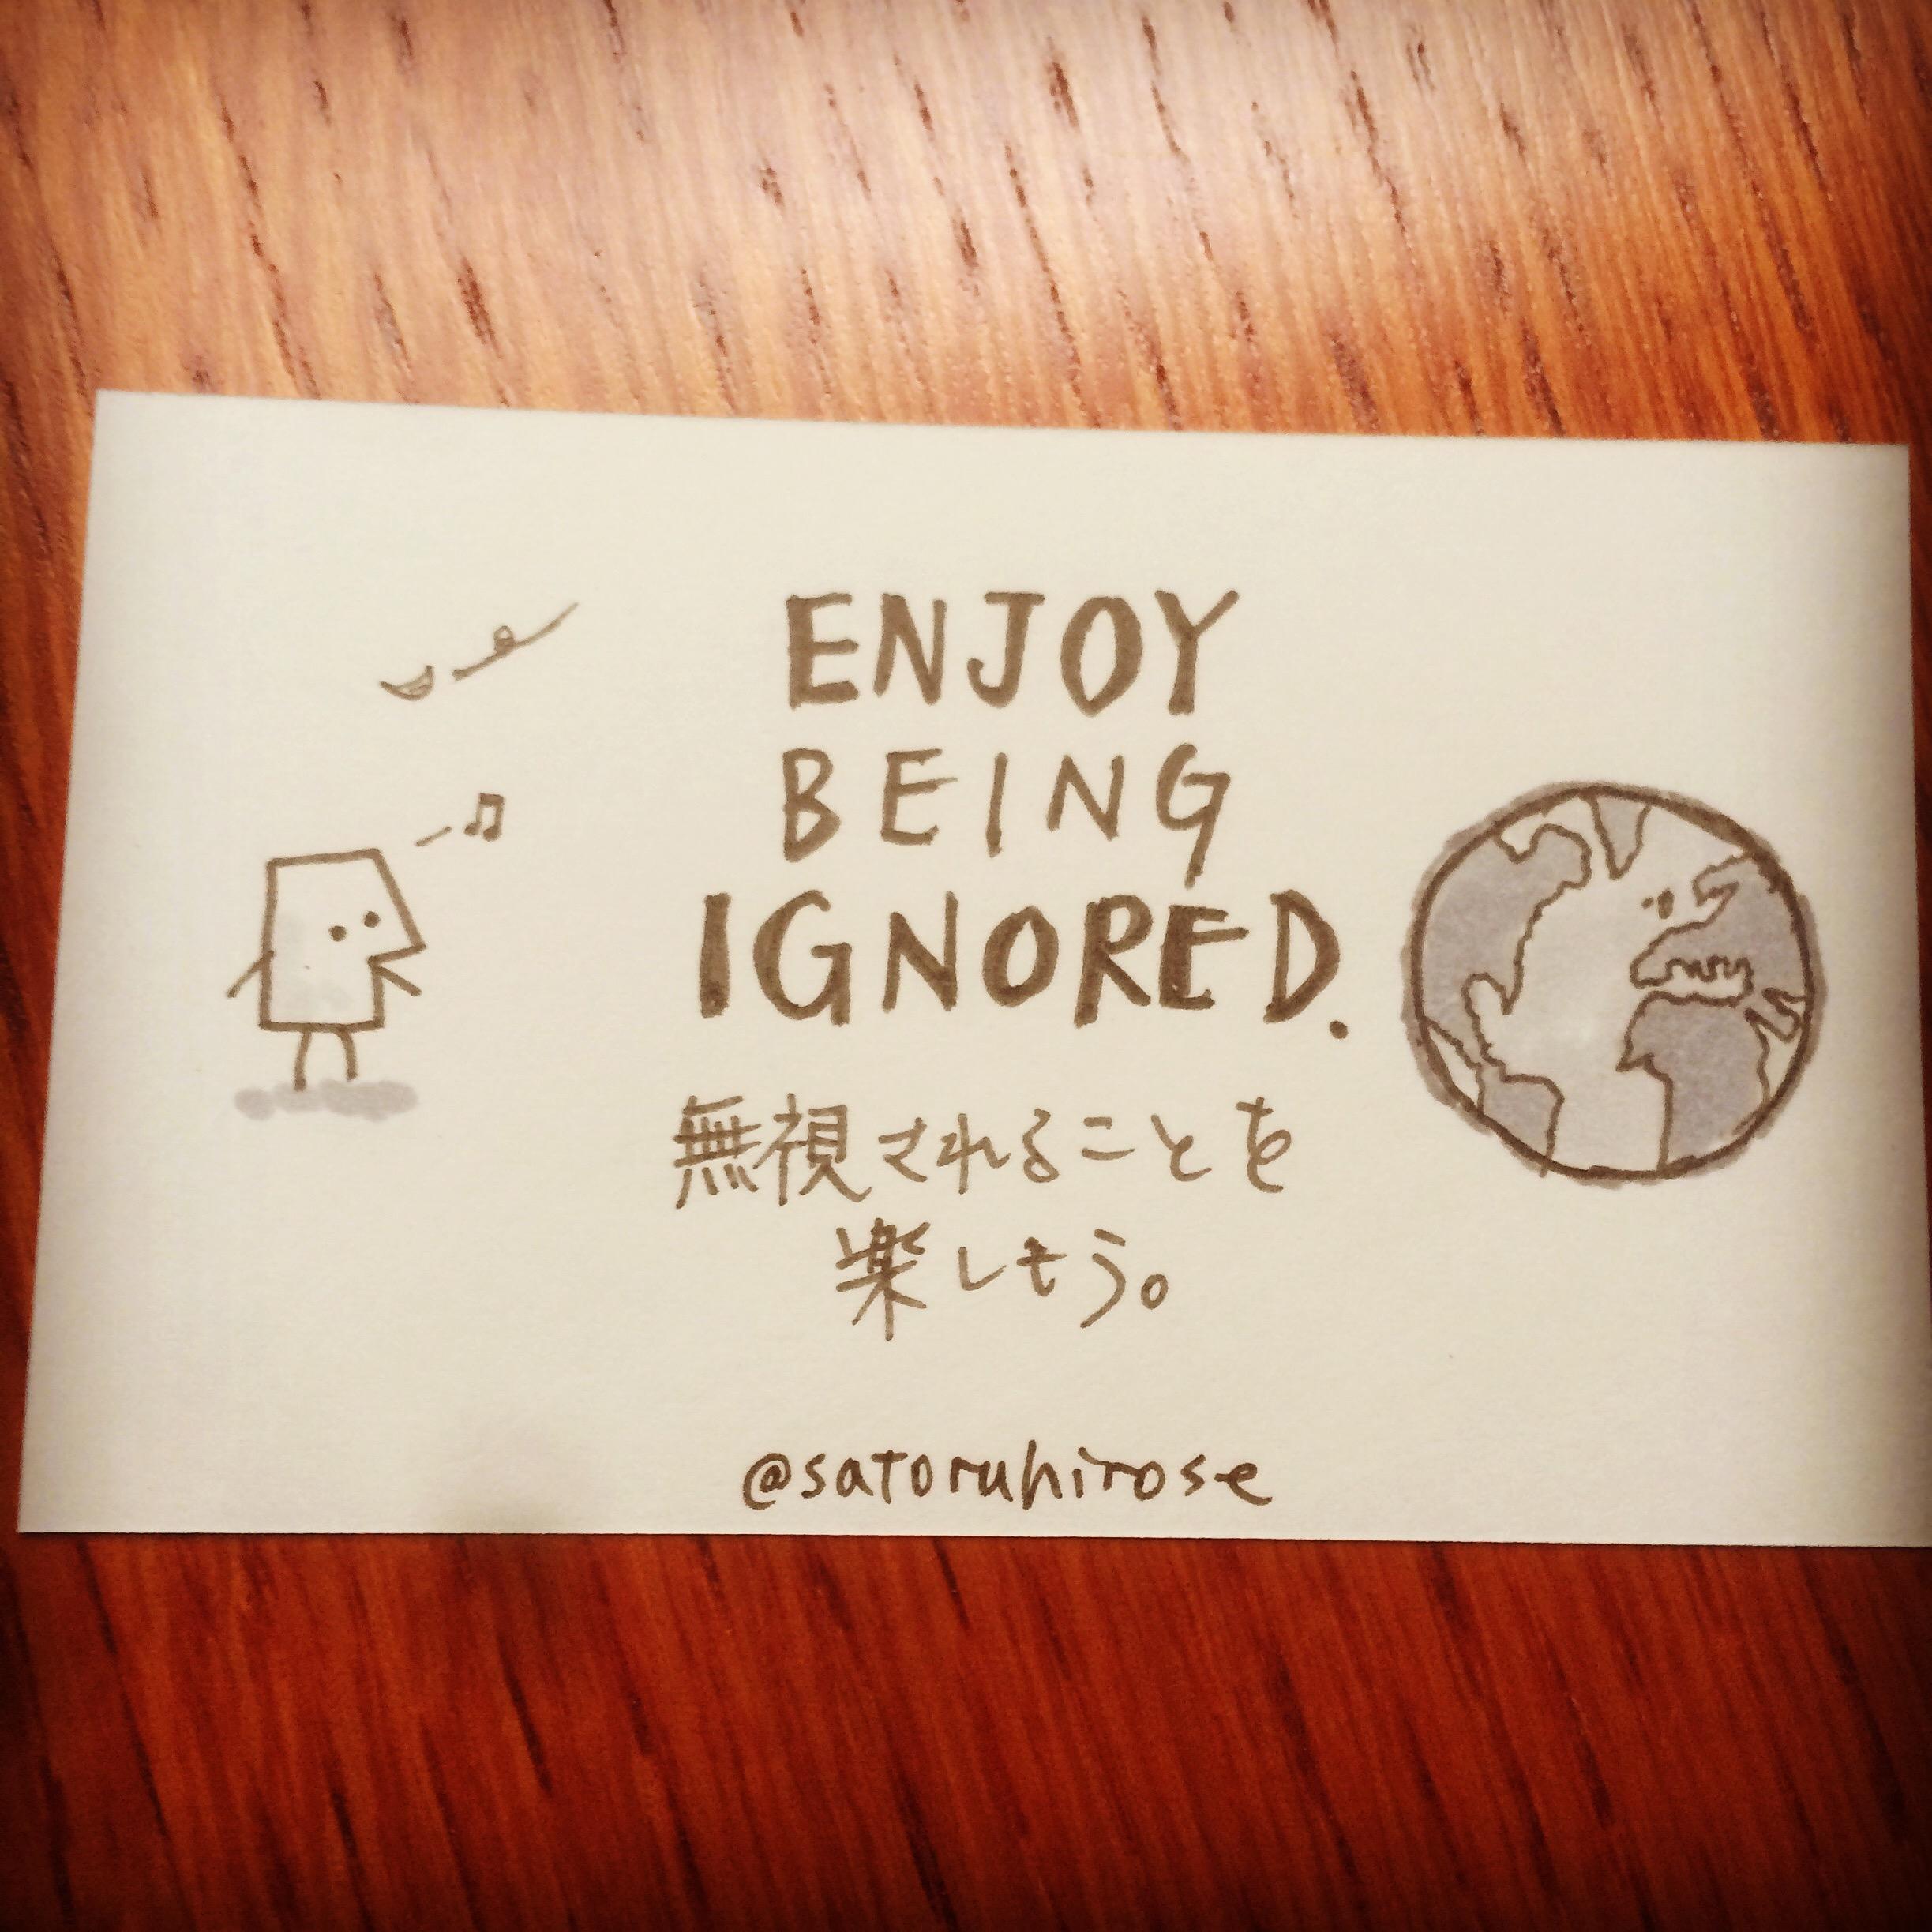 Enjoy being ignored.